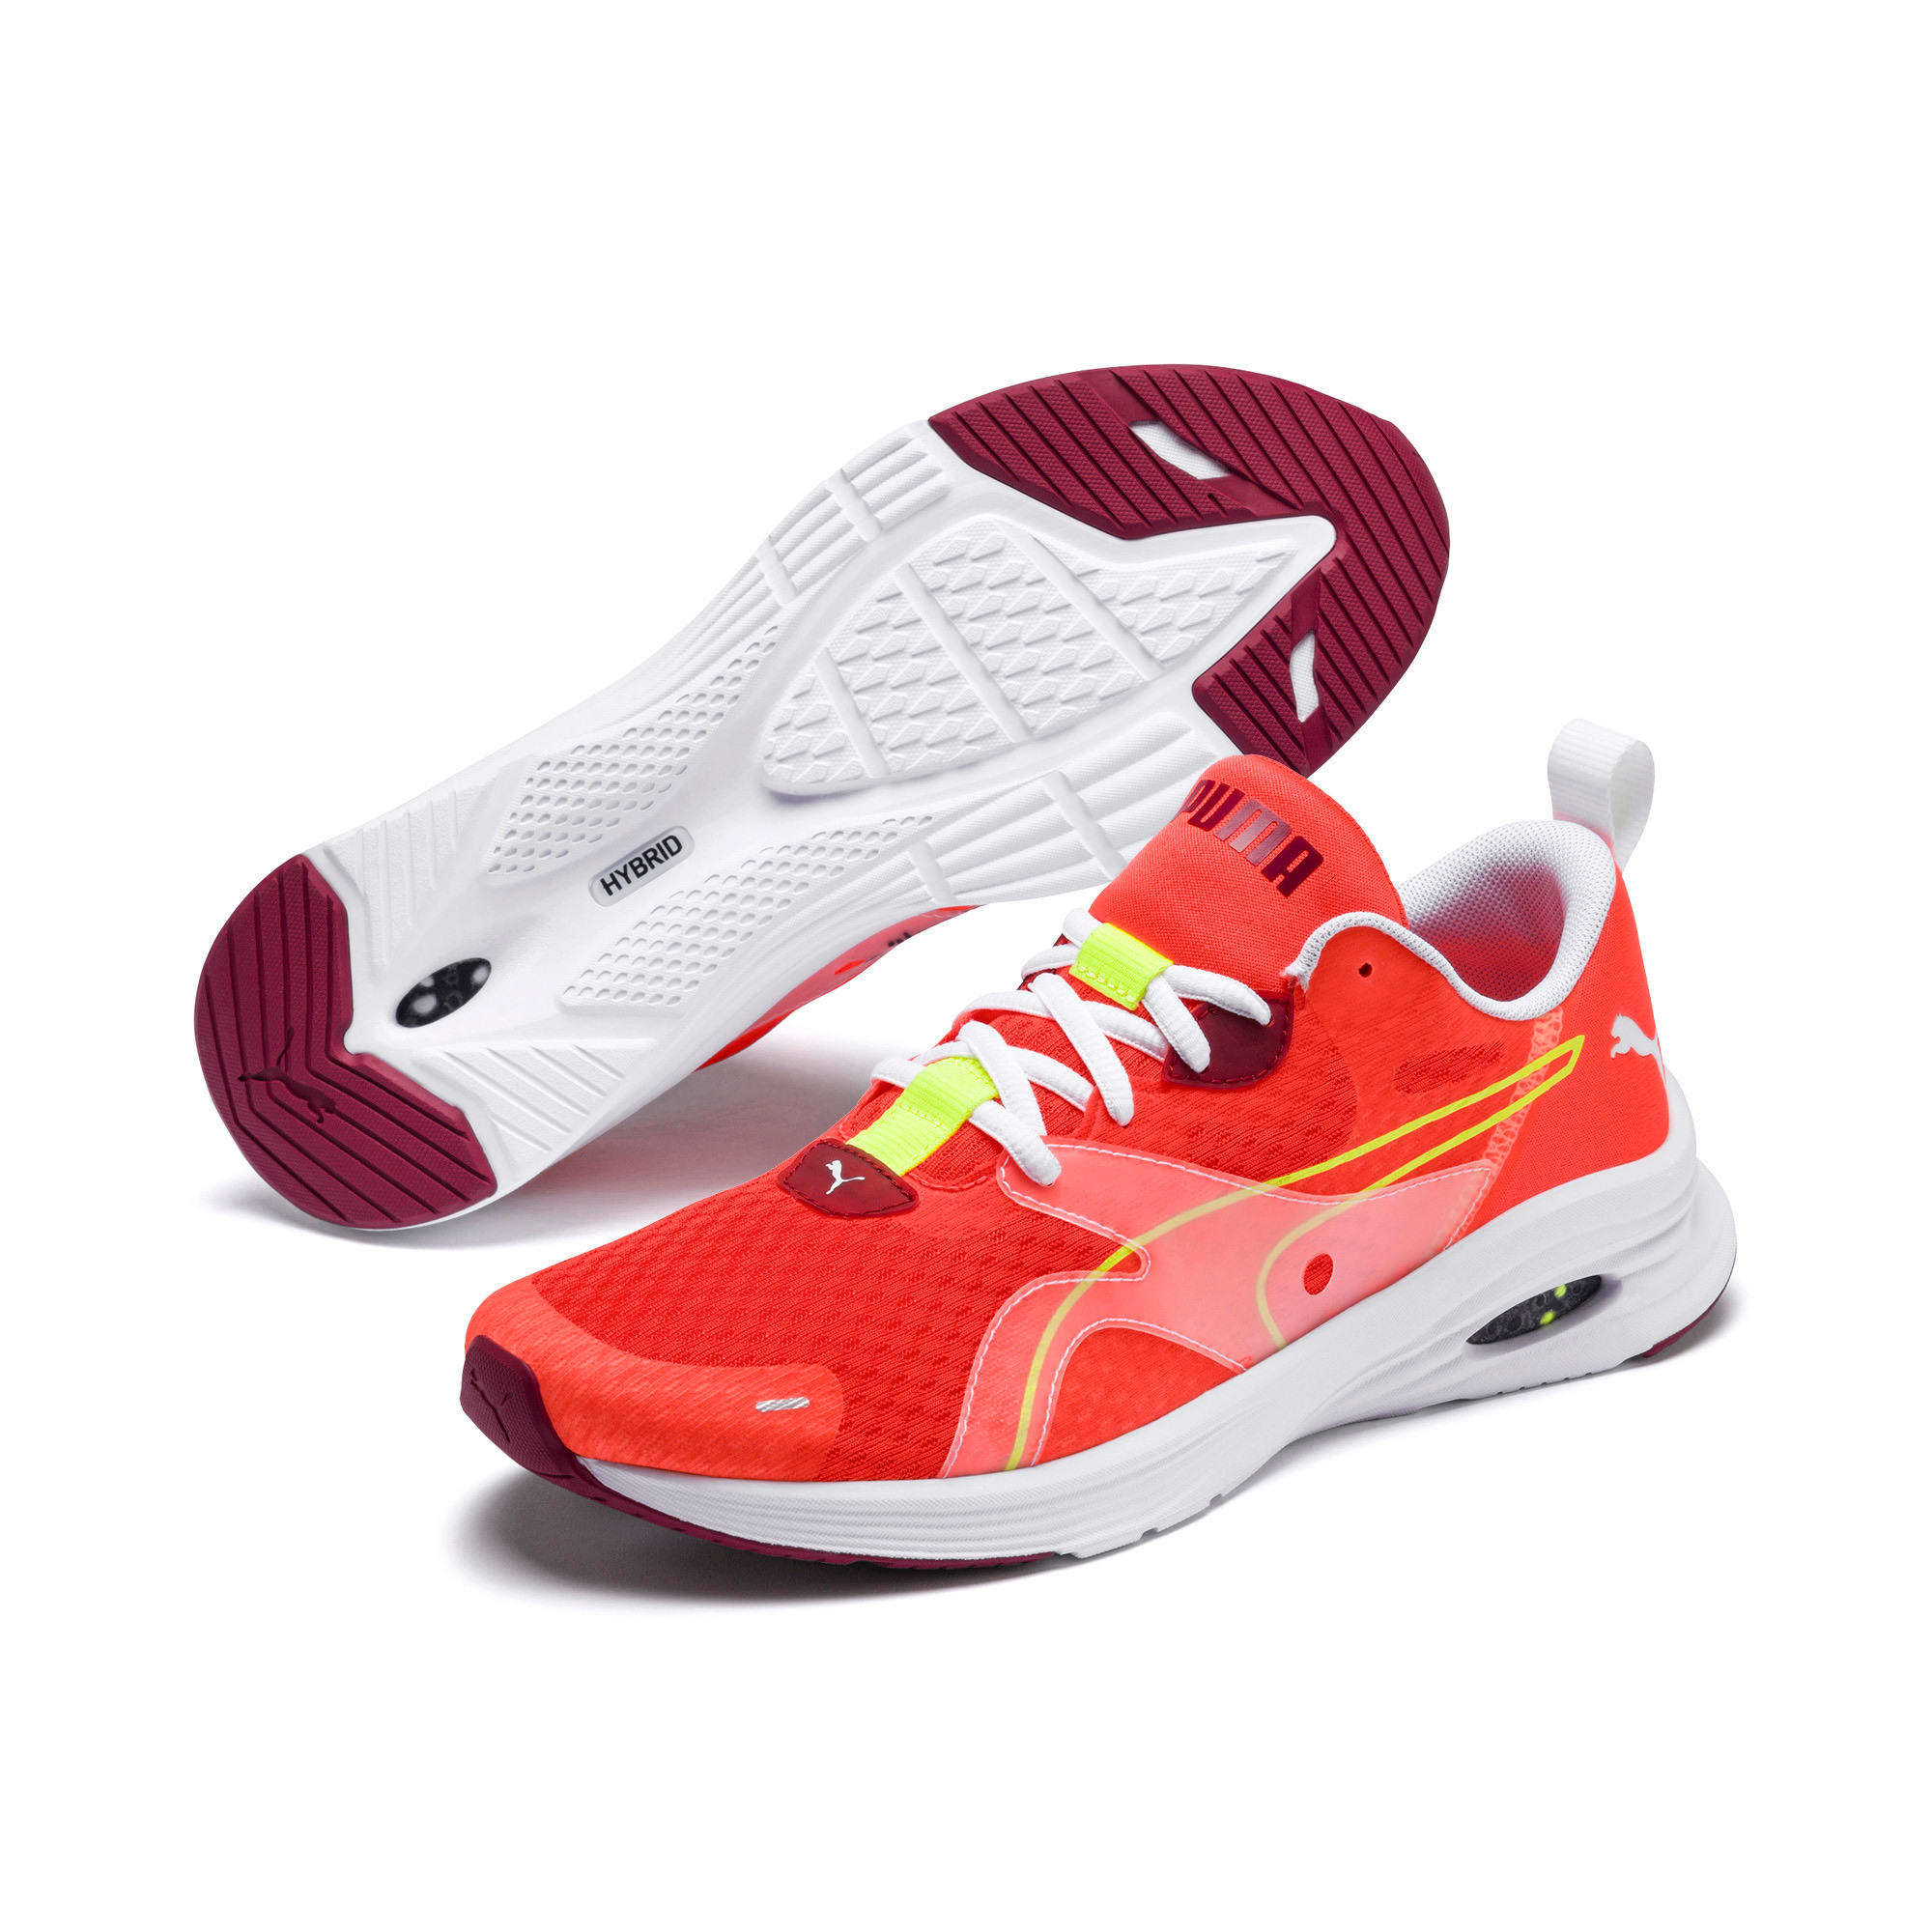 Thumbnail 2 of HYBRID Fuego Men's Running Shoes, Nrgy Red-Rhubarb, medium